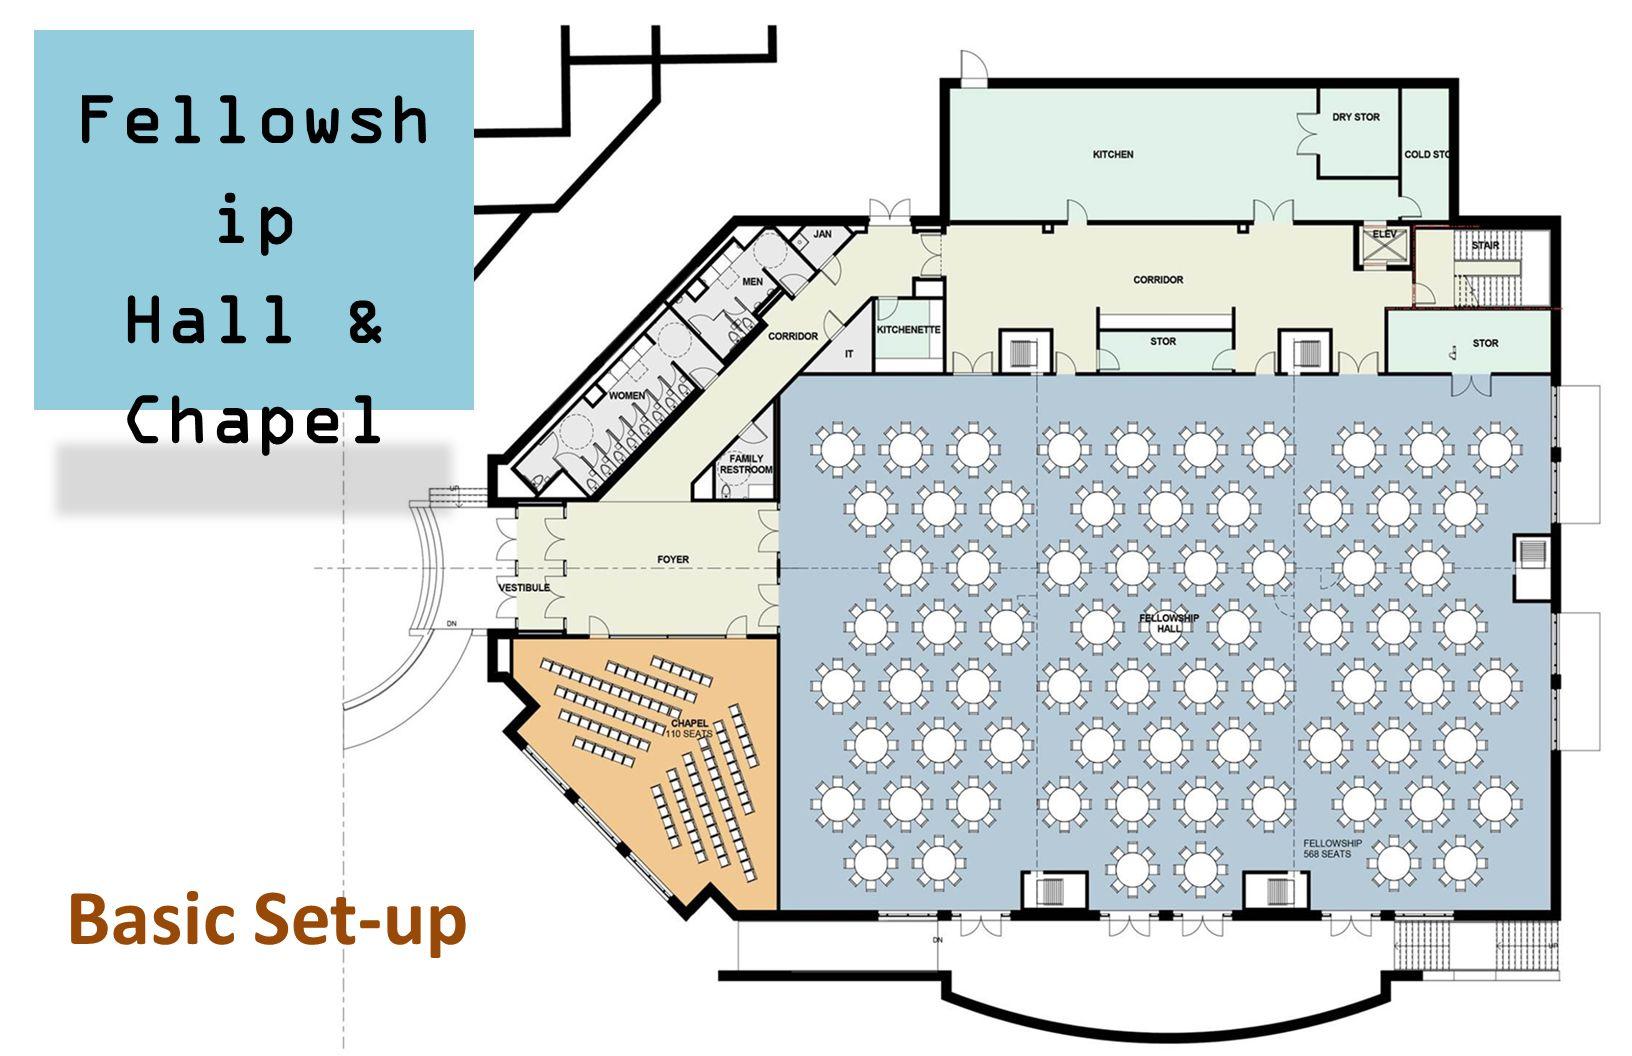 Fellowsh ip Hall & Chapel Basic Set-up